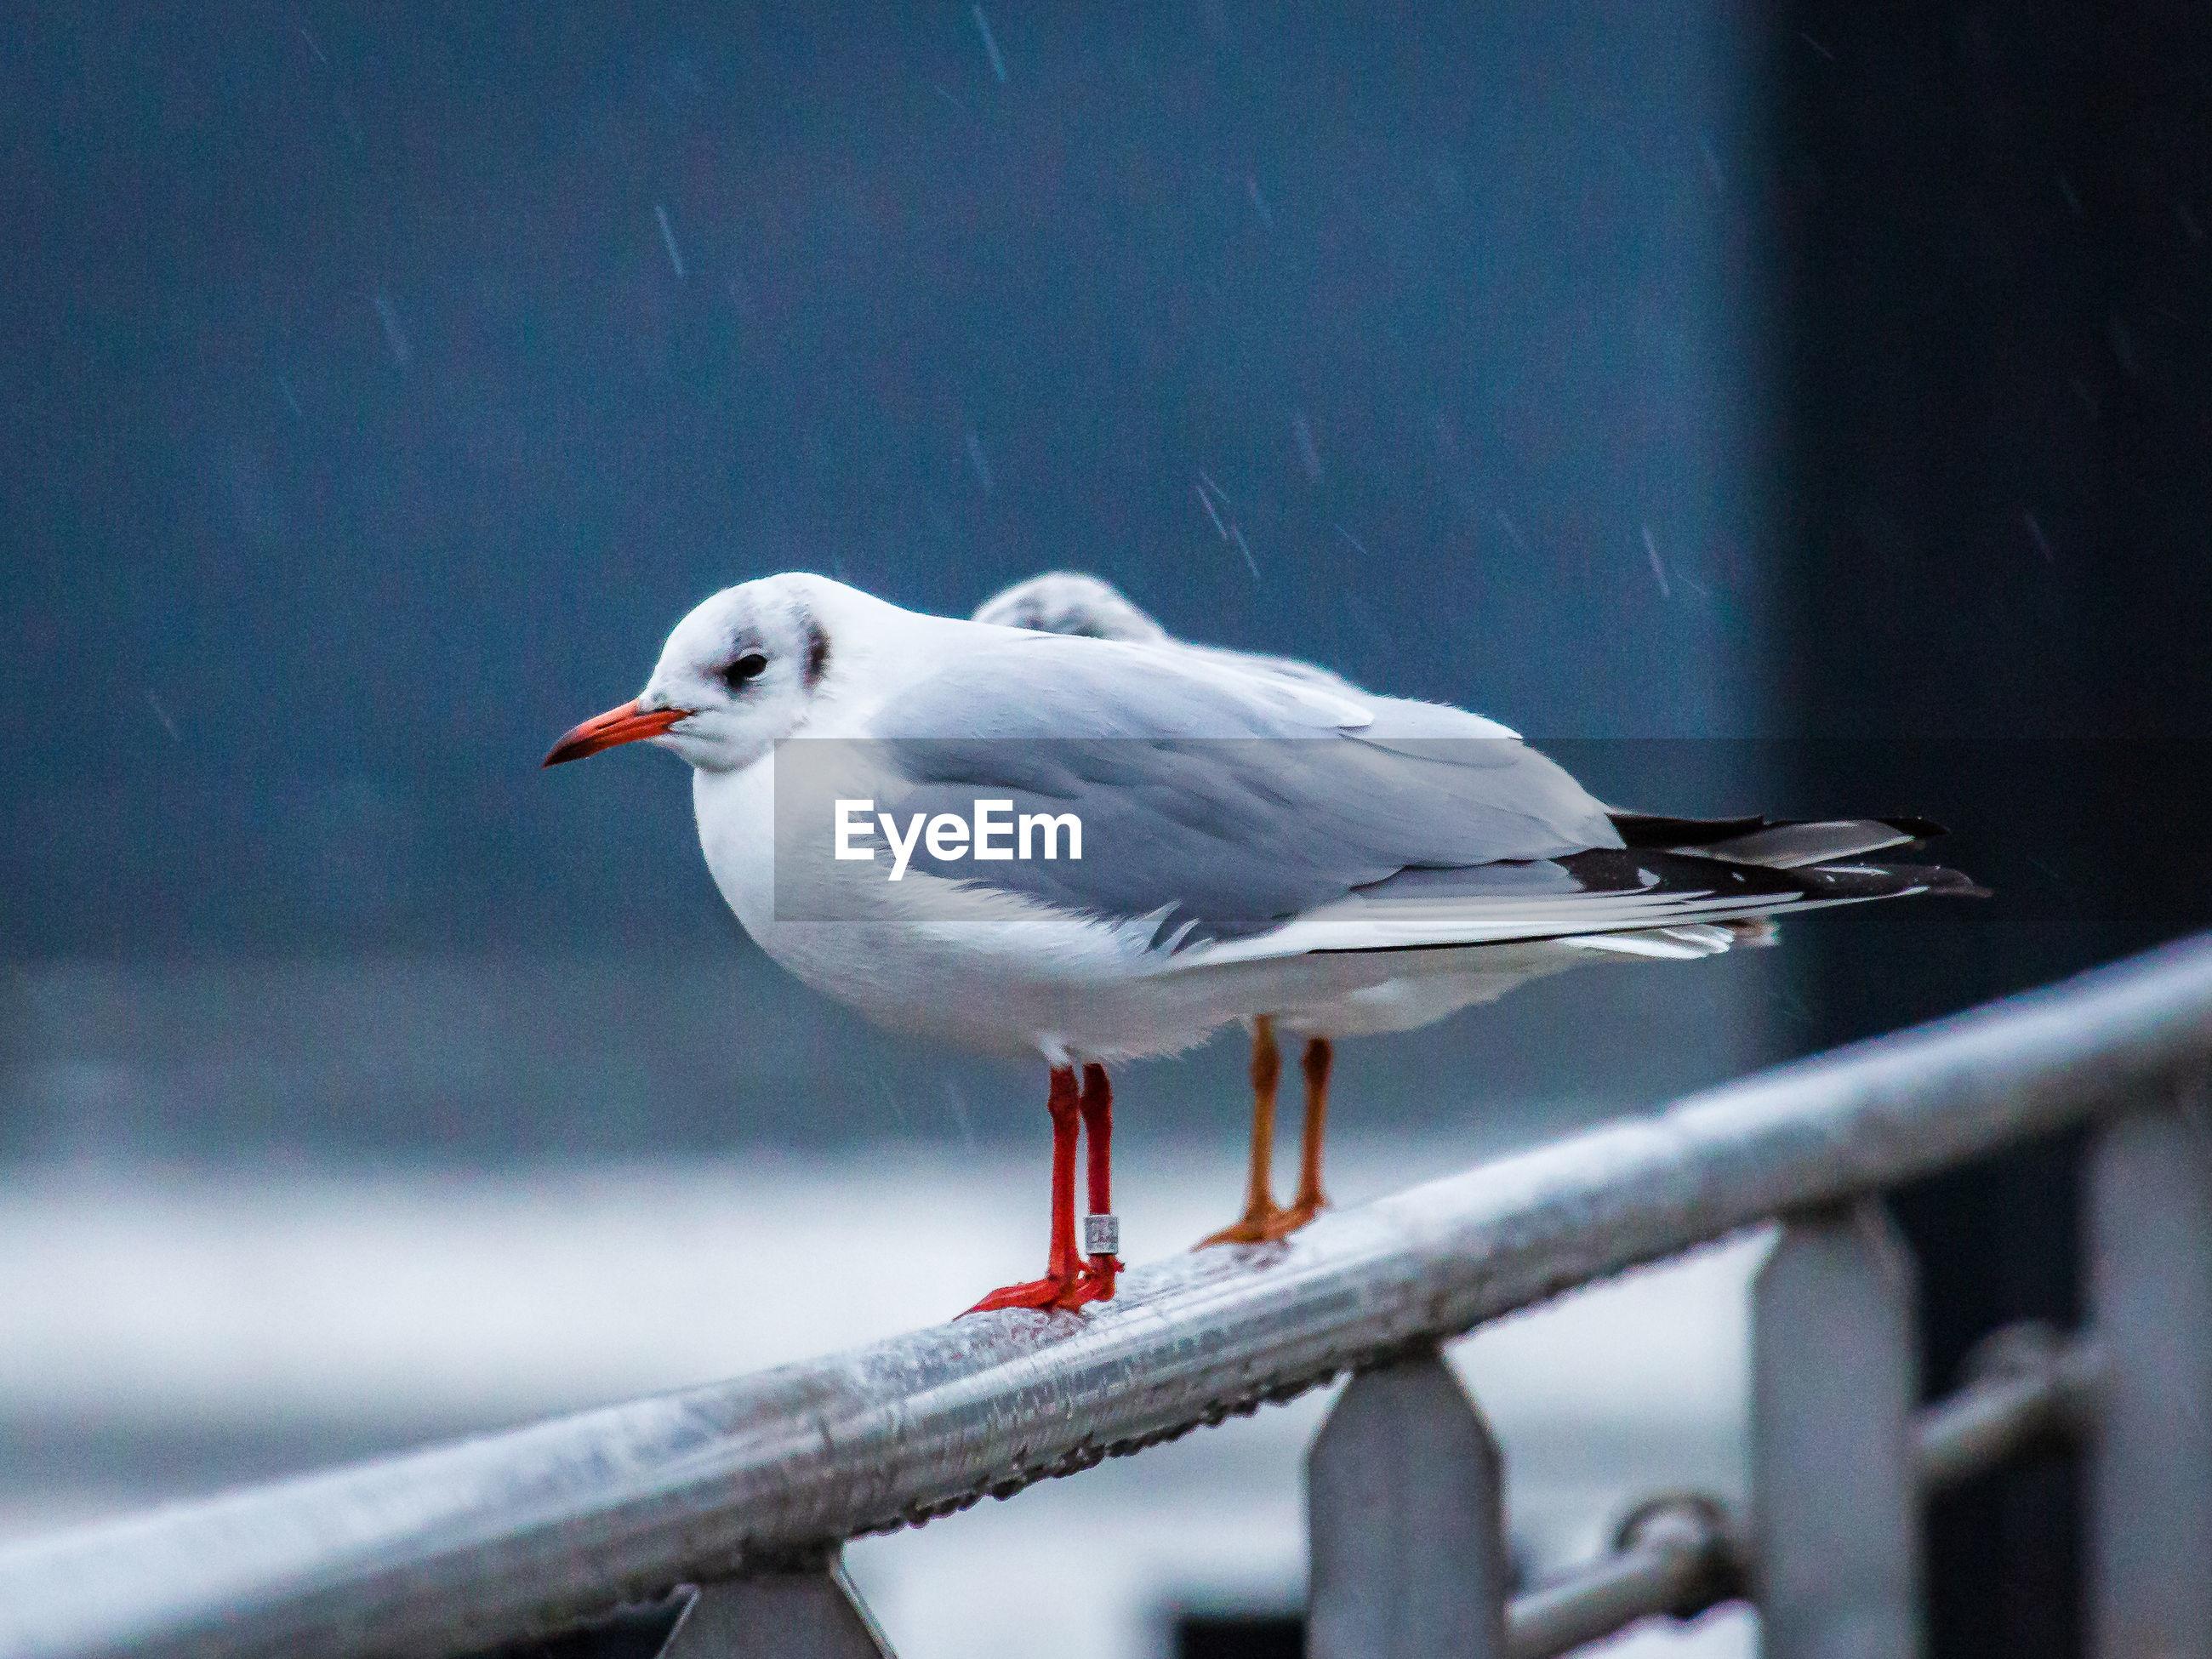 Seagulls on railing during rainy season